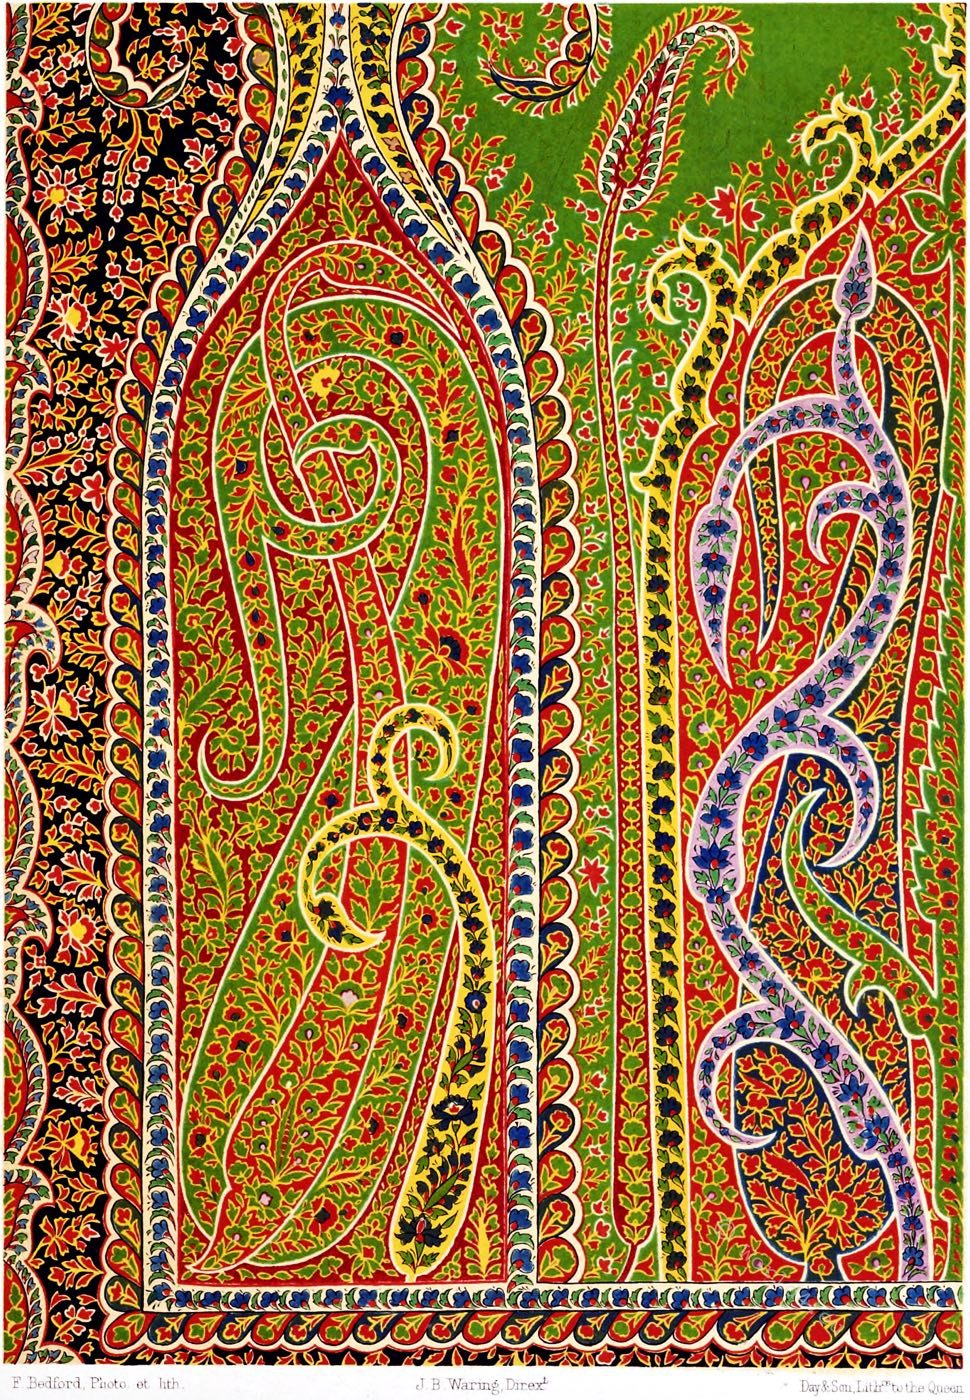 India, Textile, Art, Design, shawl, traditional, Moghul,